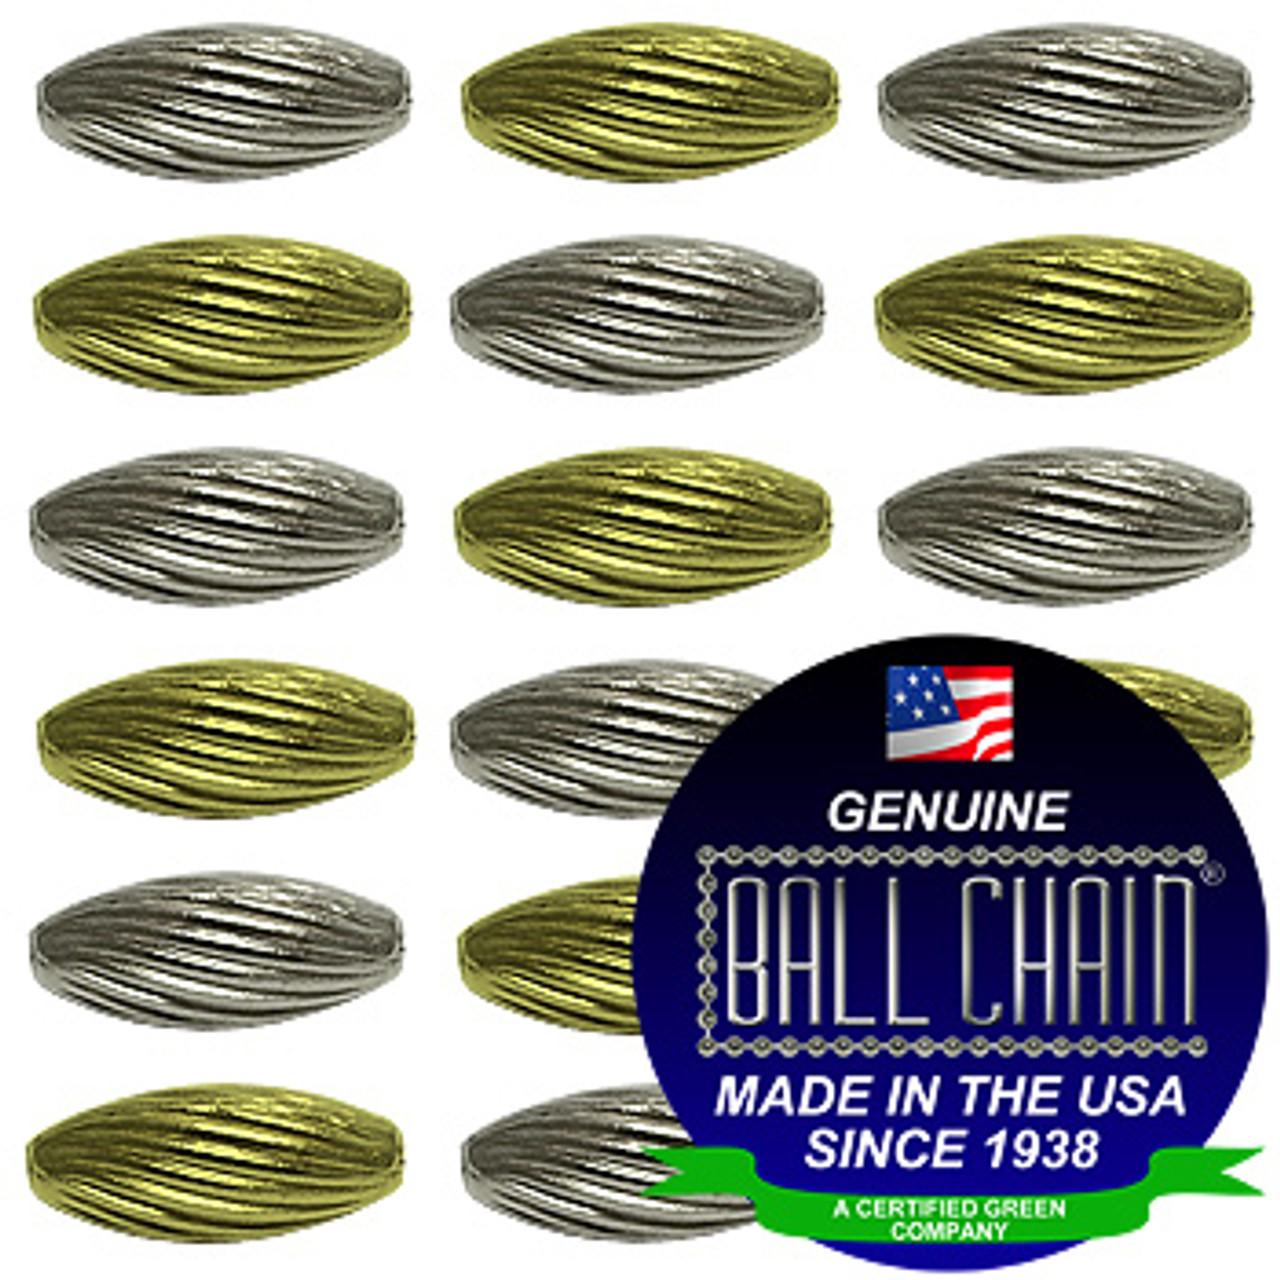 3.2mm x 6.9mm Elliptical Bars Spiral - Nickel Plated Brass, Yellow Brass, or Gilding Metal